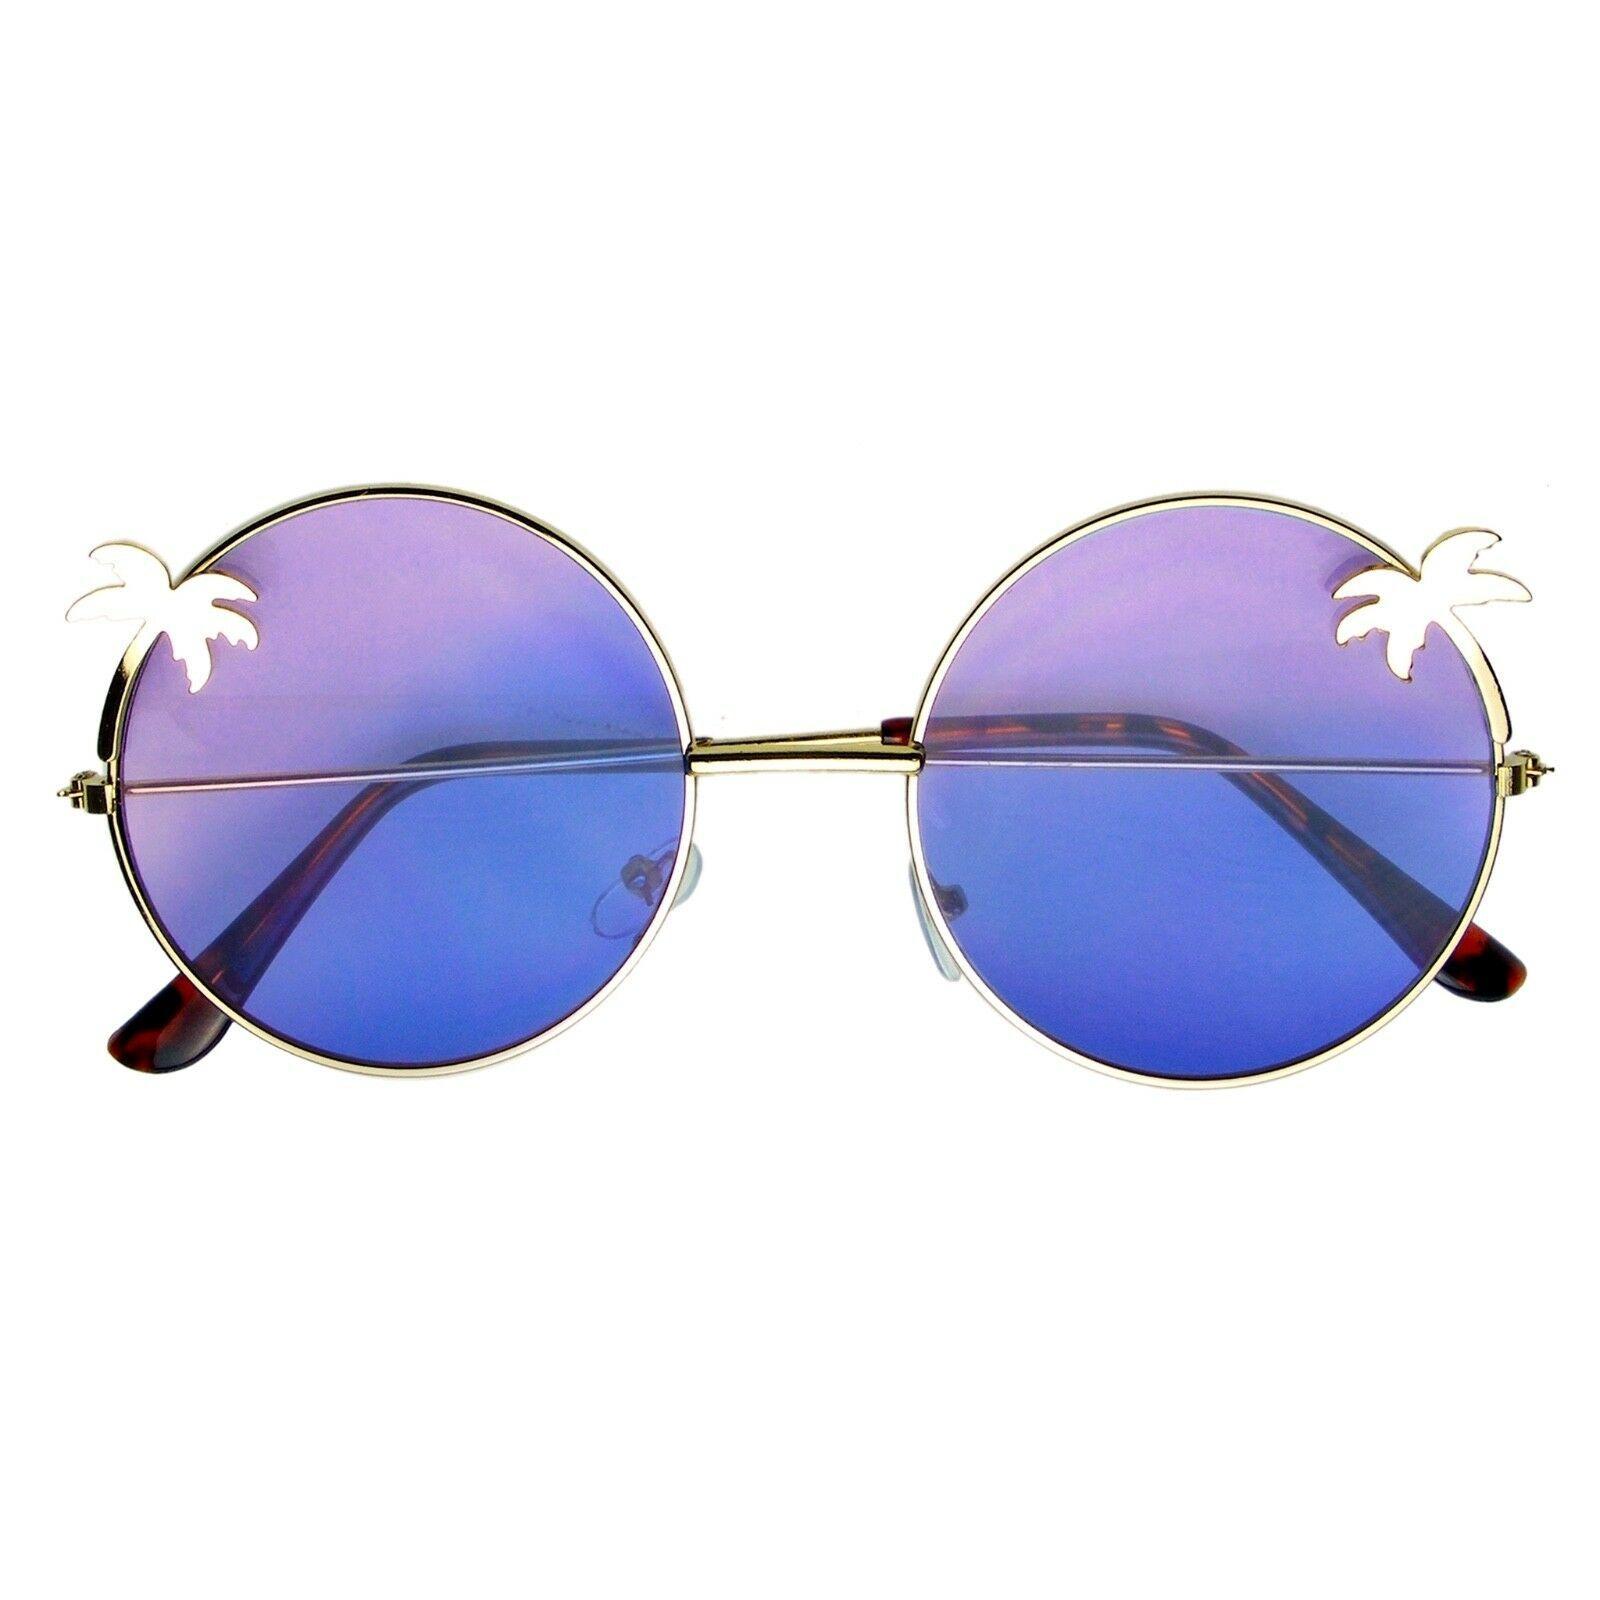 Vintage Retro Round Sun Glasses Hippie Boho Sunglasses image 2